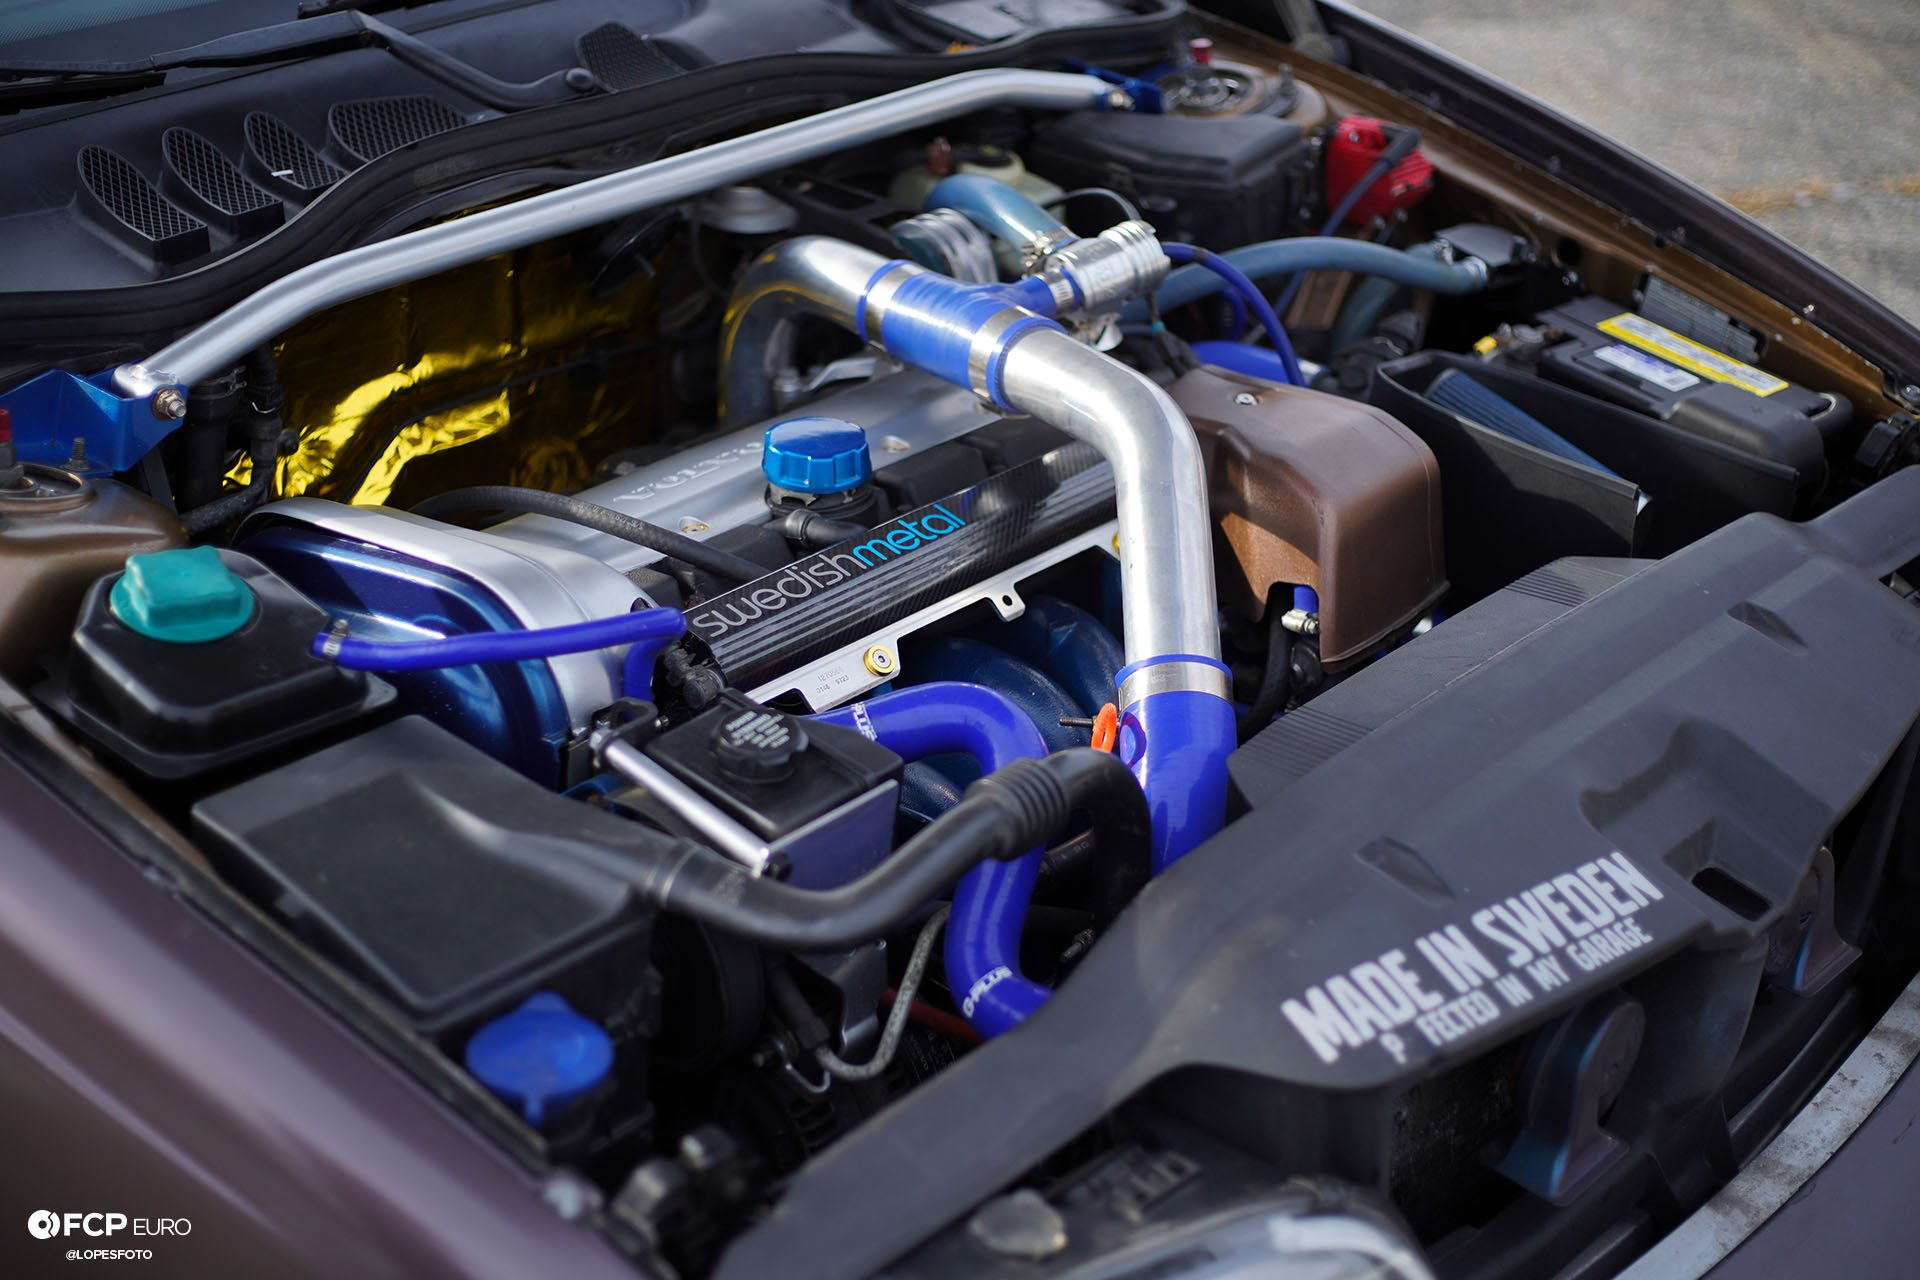 Volvo S70 T5M Turbo Engine Bay